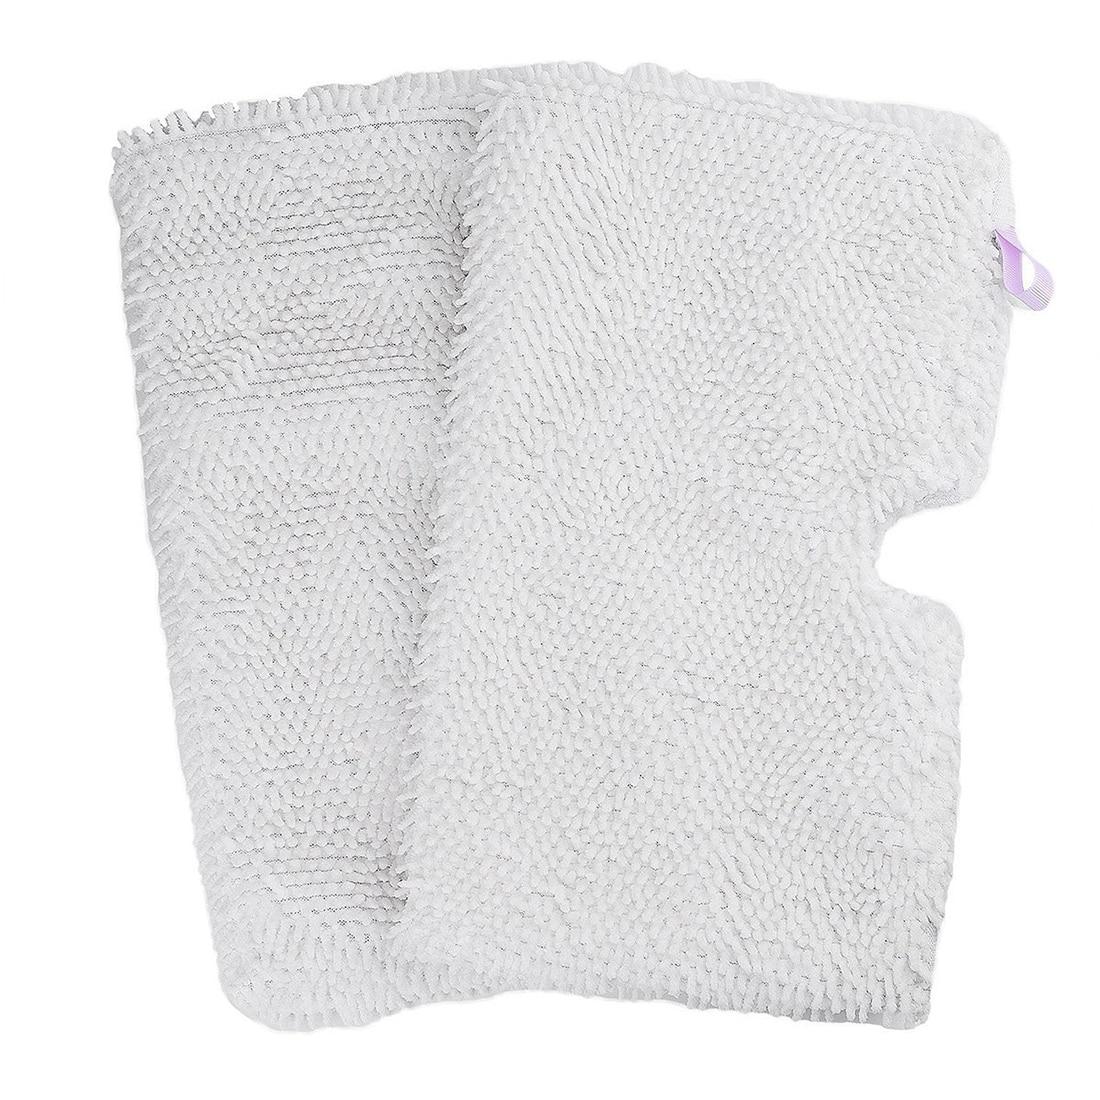 2-paquete lavable microfibra fregona almohadillas de limpieza para Shark Steam Pocket Mops S3500 series, S3501, s3601, S3550, S